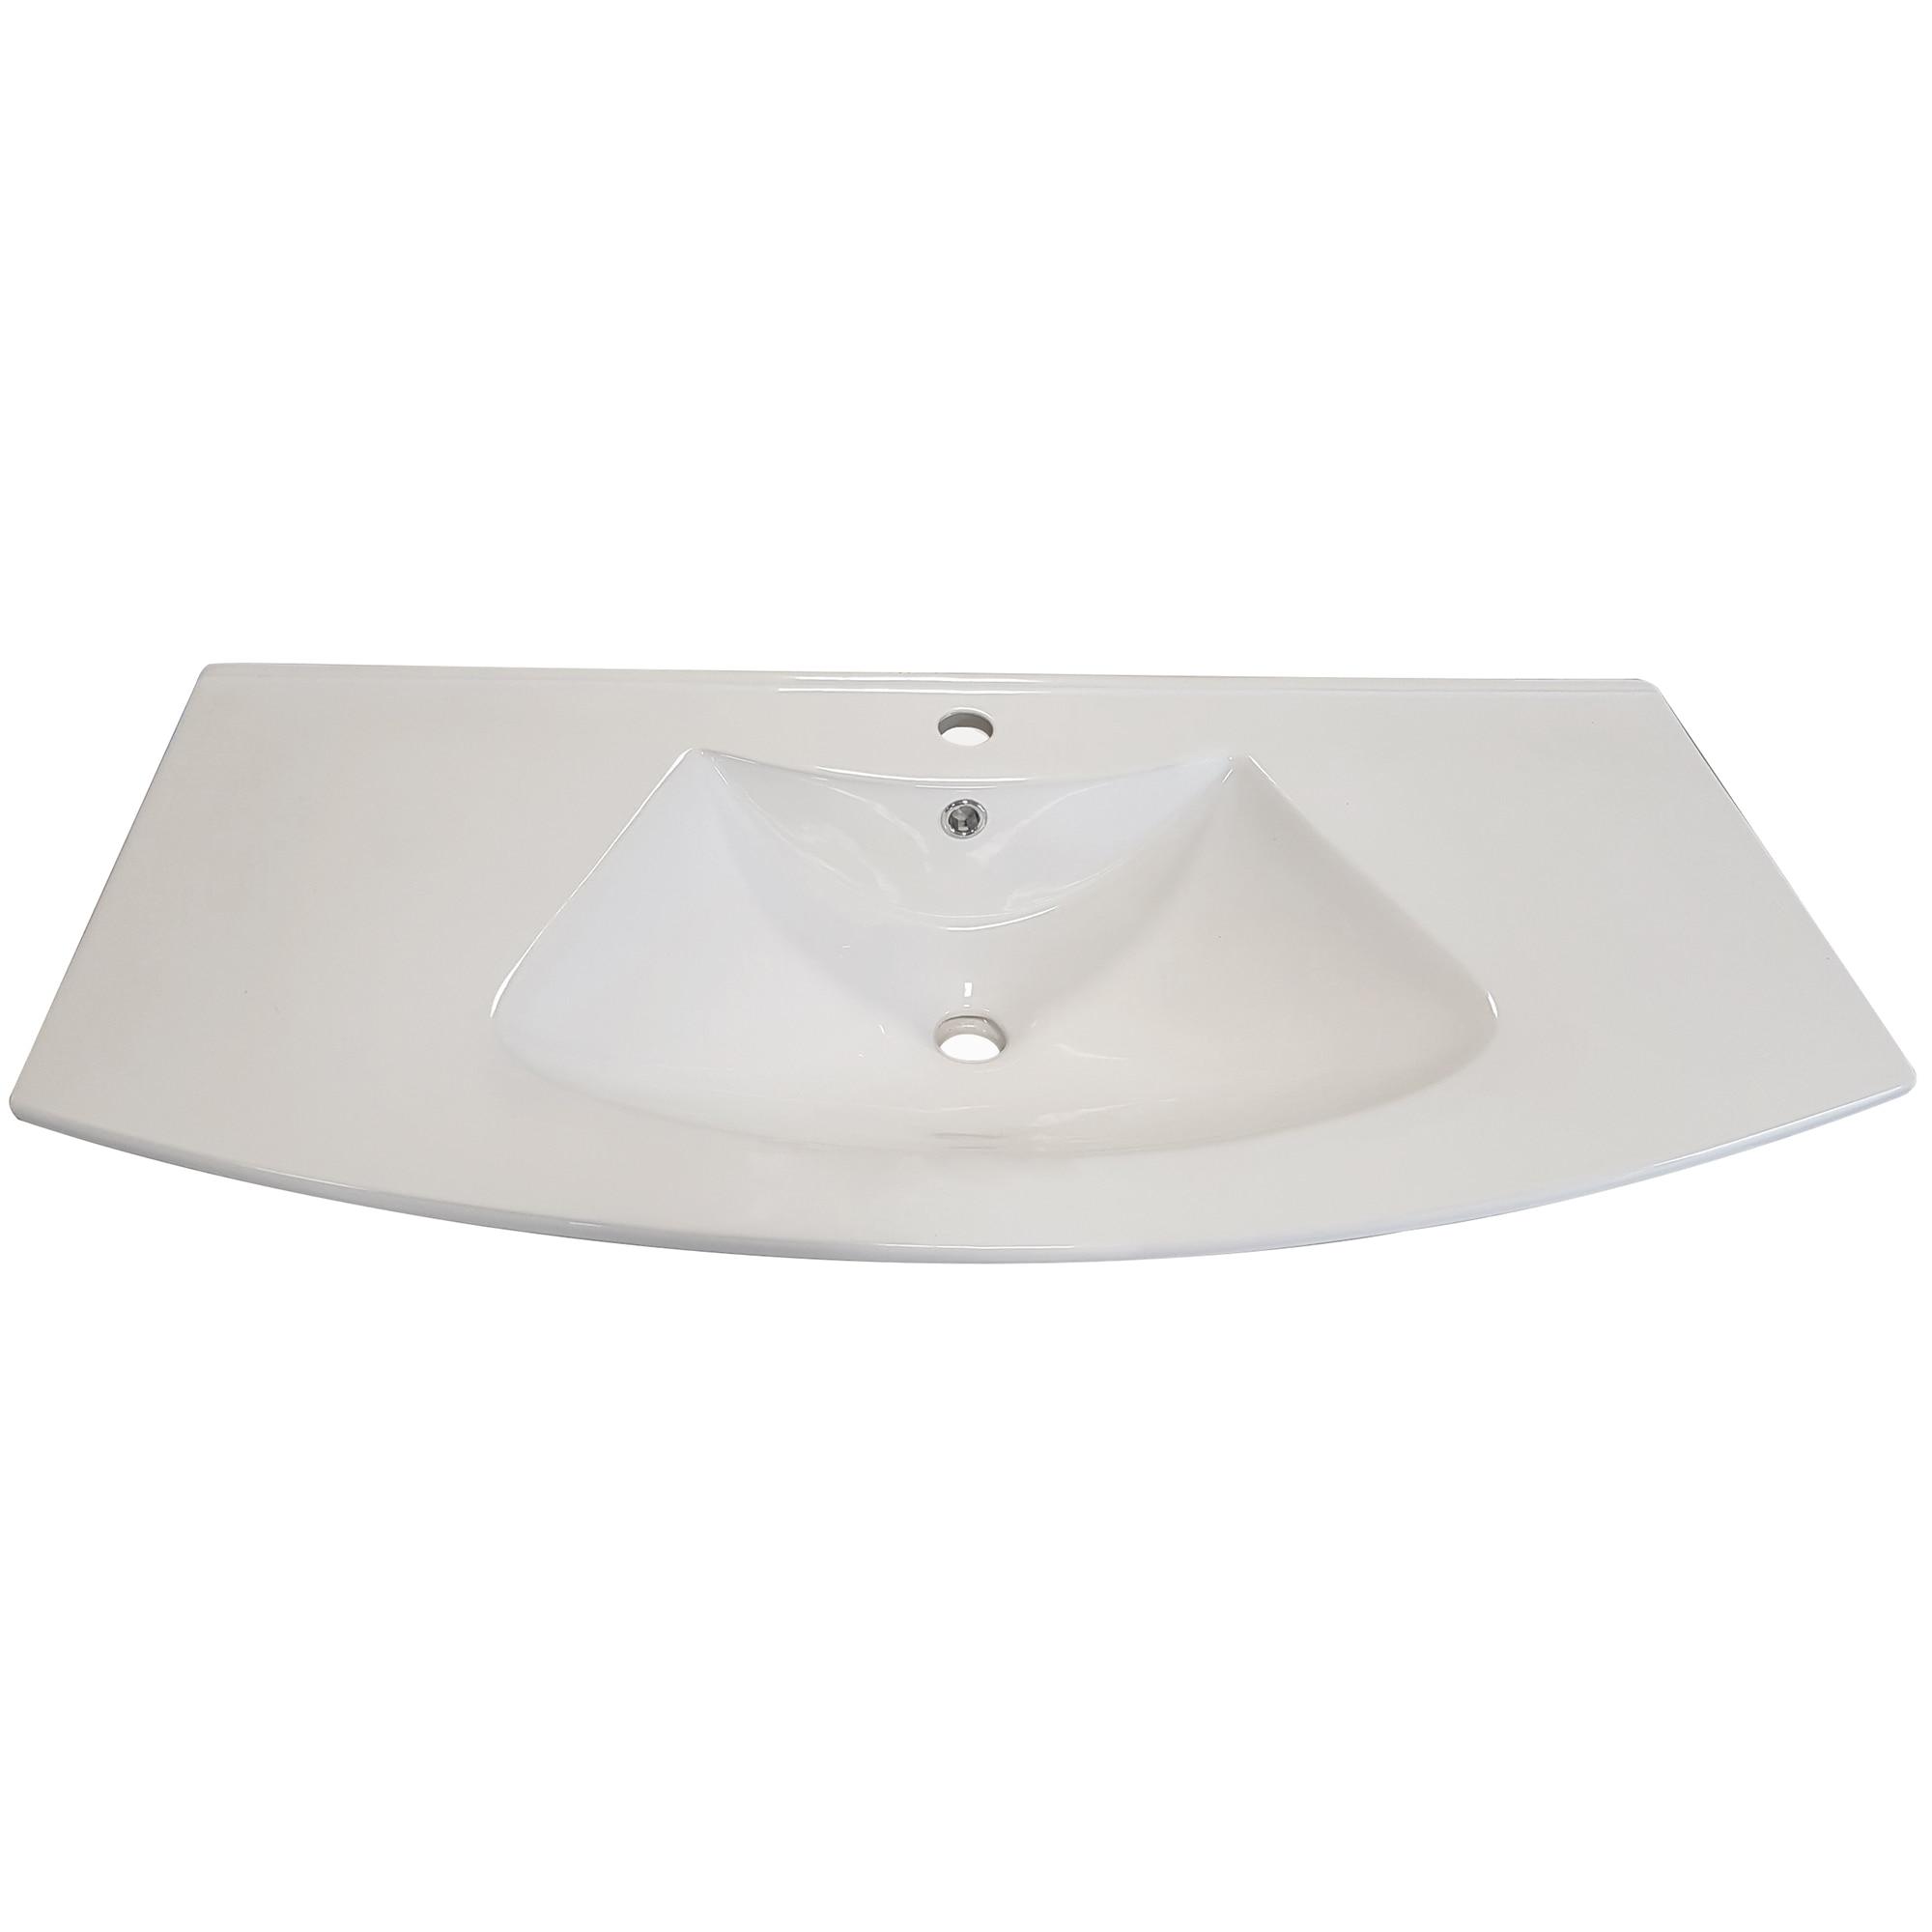 Fotografie Lavoar ceramic Kring Luna, alb, 102x18x49 cm